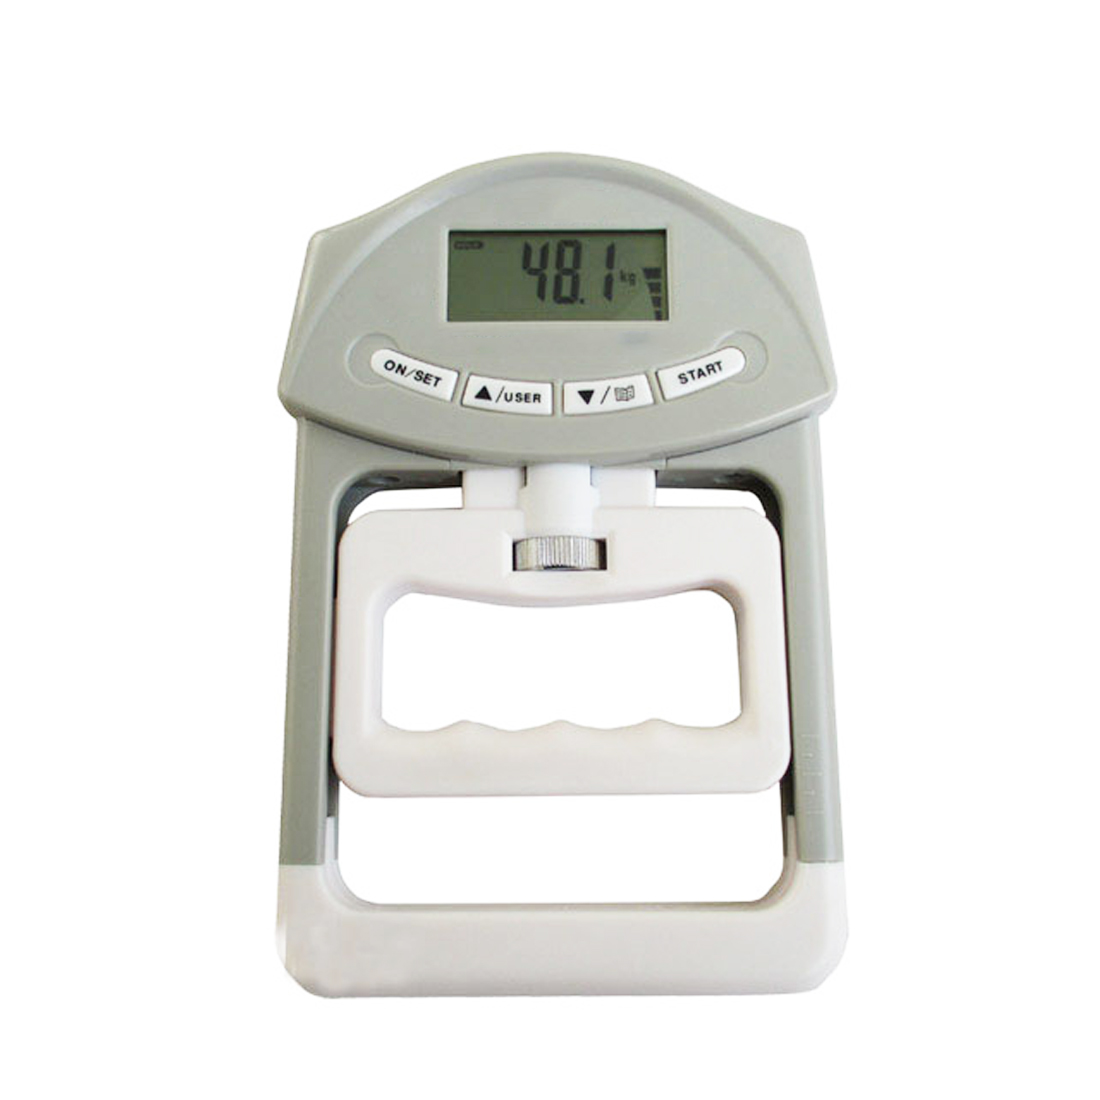 Measurement Strength Meter for Body Building Gym Exercises 90kg/198Ib Digital LCD Dynamometer Hand Grip Power basketball